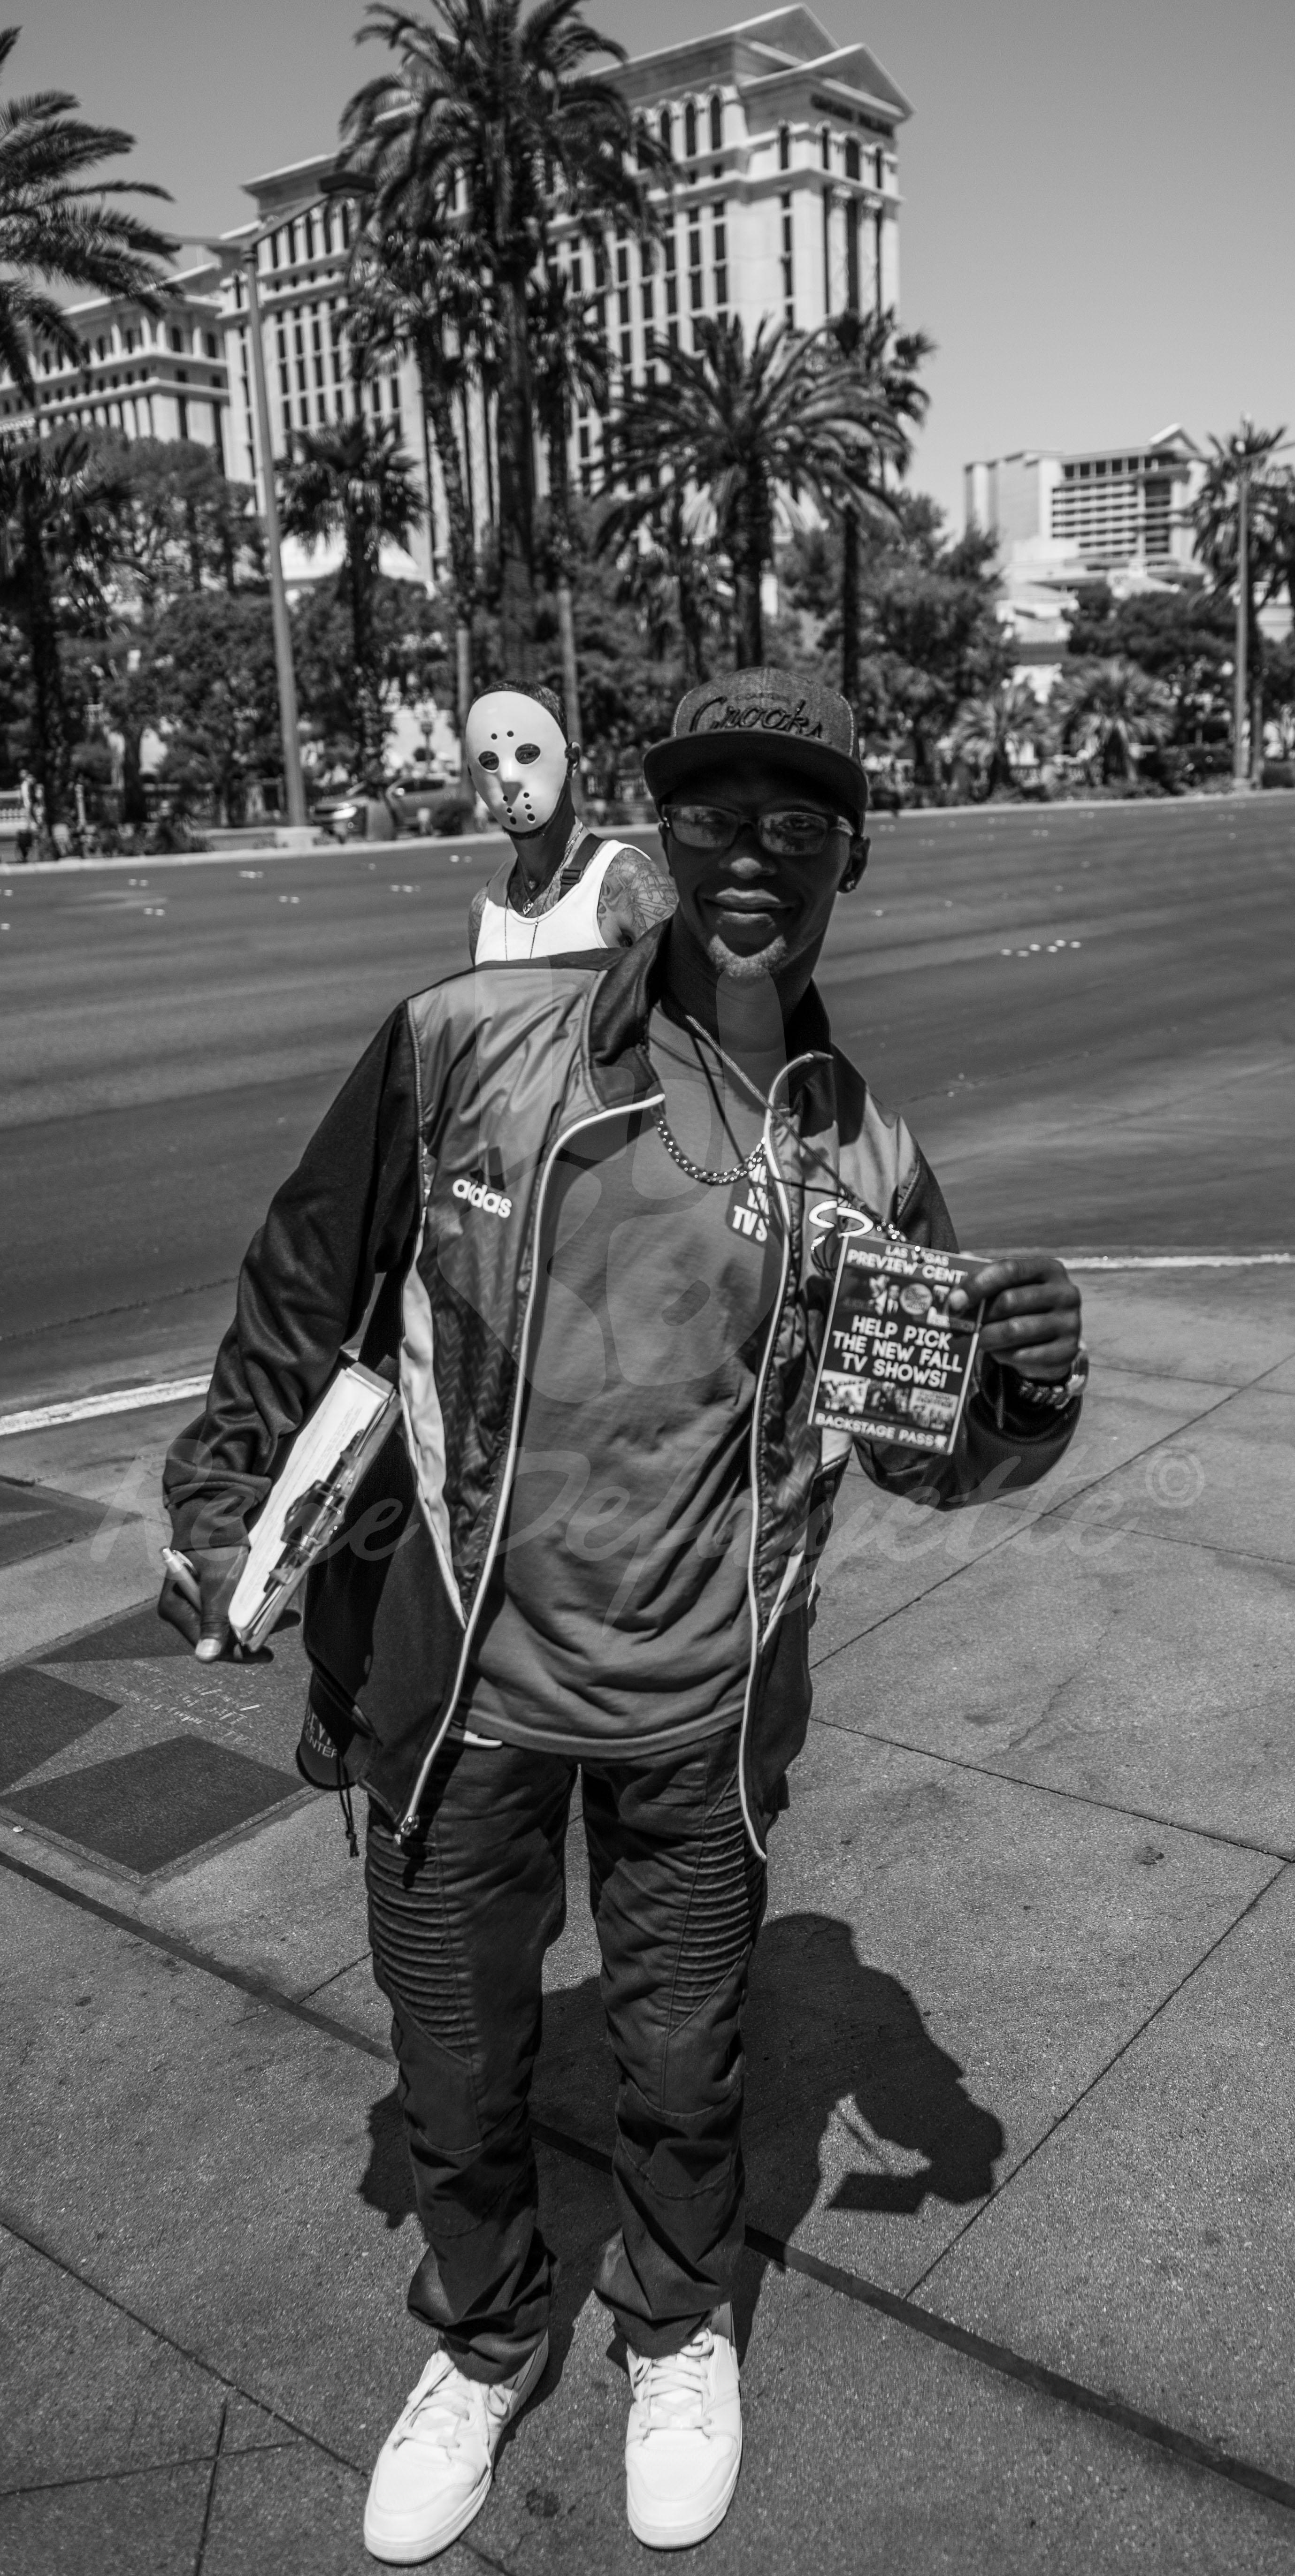 Photo Las Vegas Jason Mask Streetphotography T1 1040636